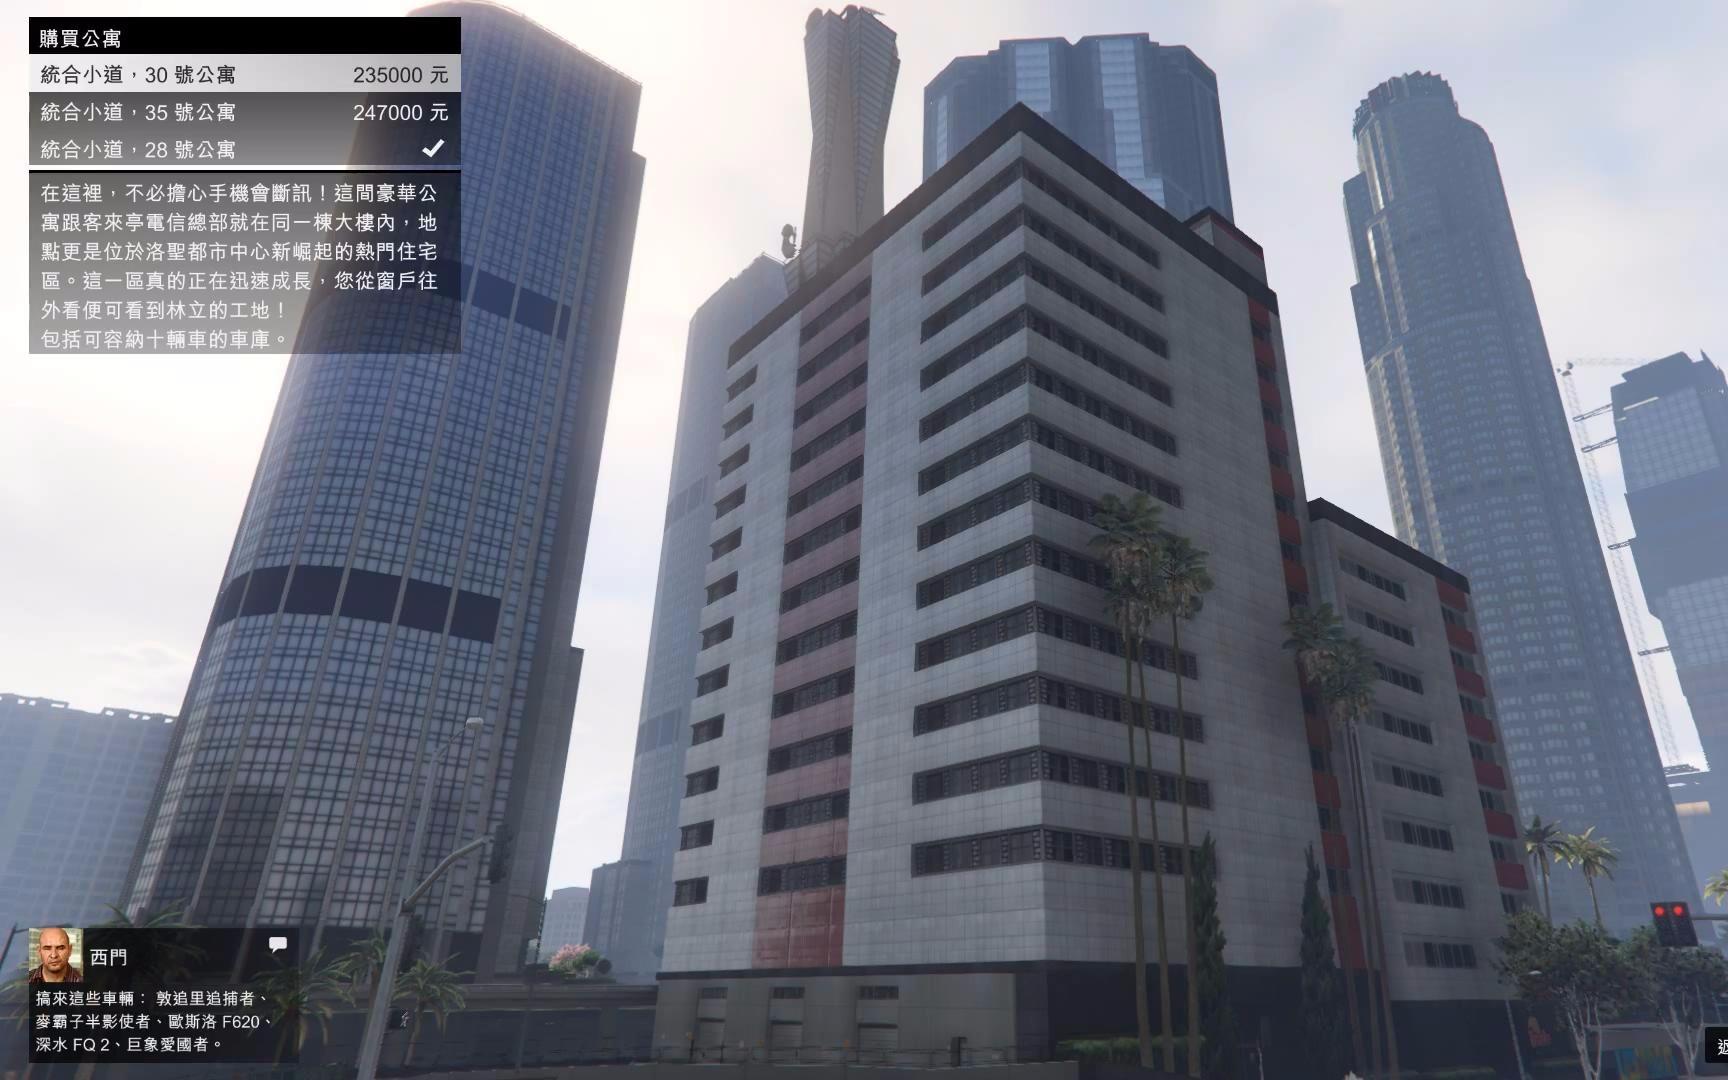 gta5终于步入上流了任务全福银行抢劫